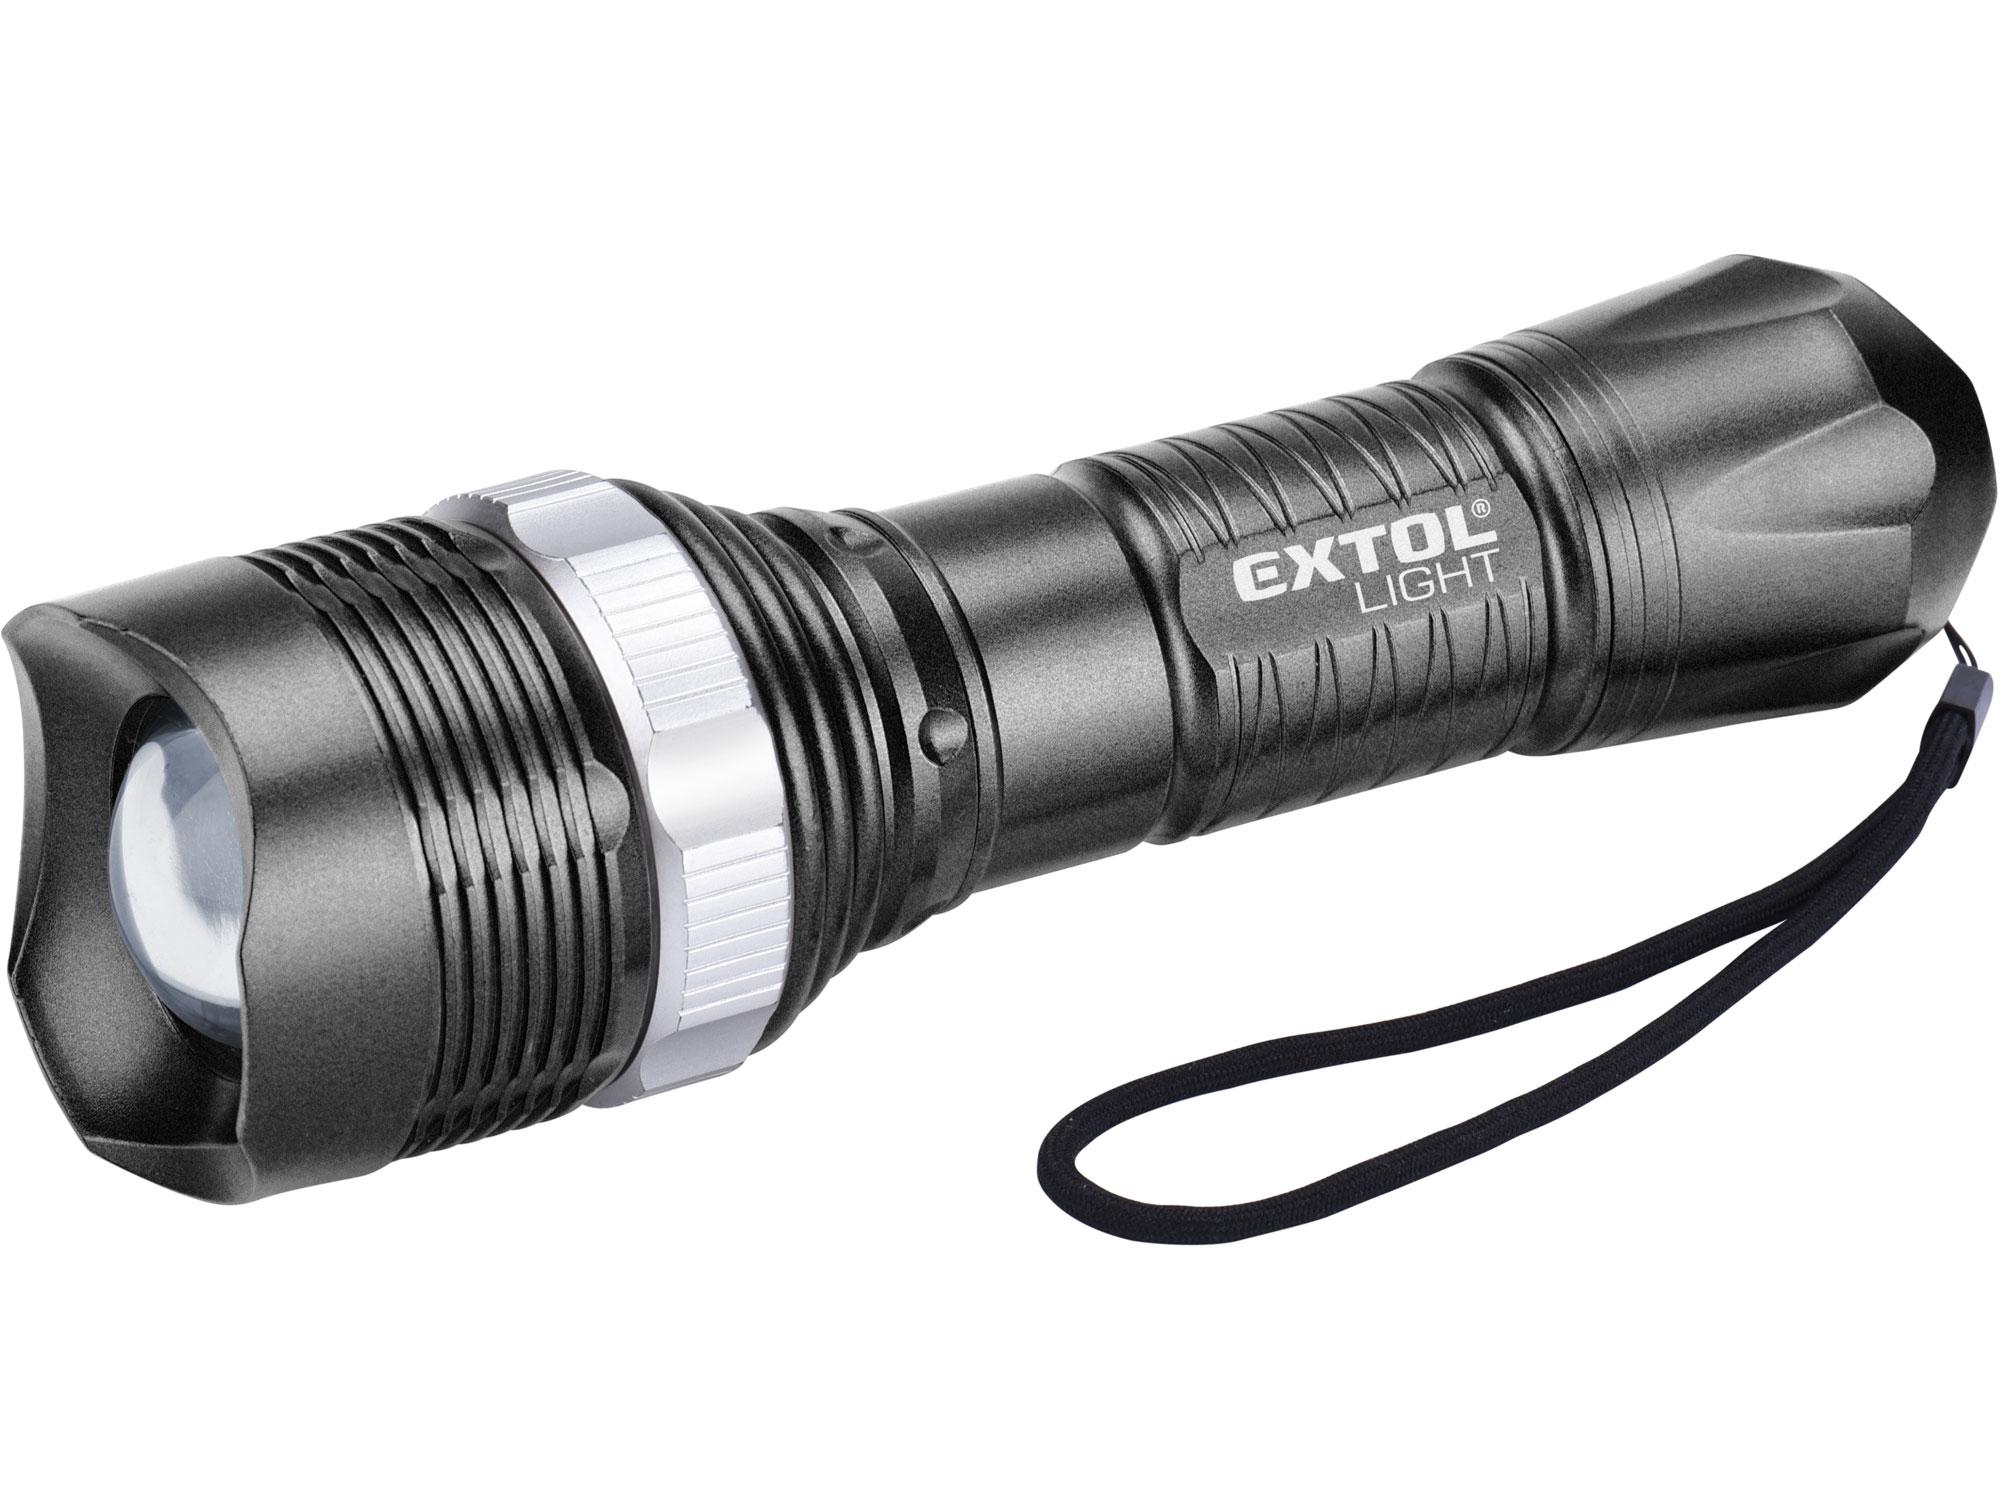 svítilna 40lm, ZOOM, 1W LED, ABS plast